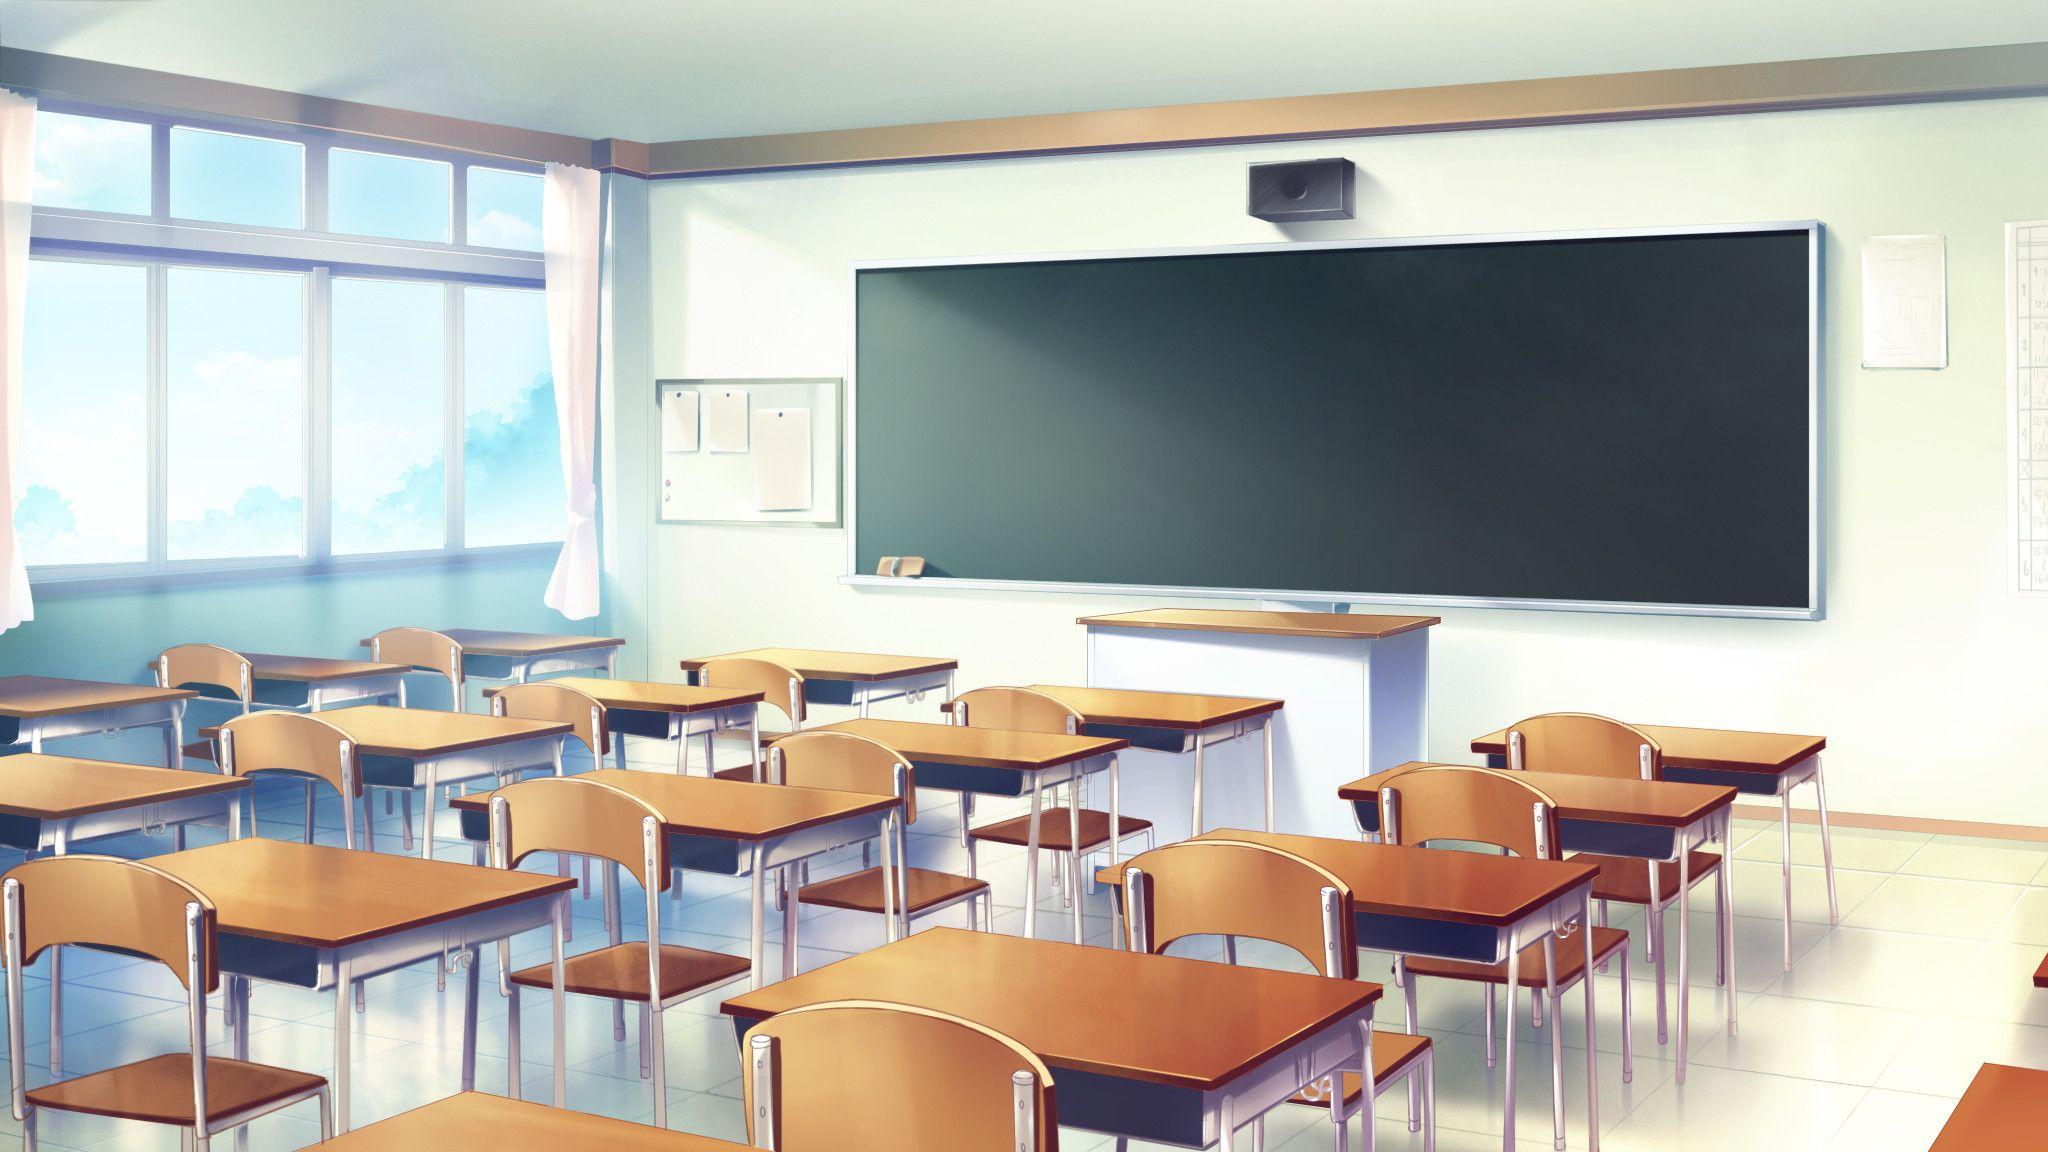 55 School Classroom Wallpapers On Wallpaperplay School Classroom Classroom Wallpaper